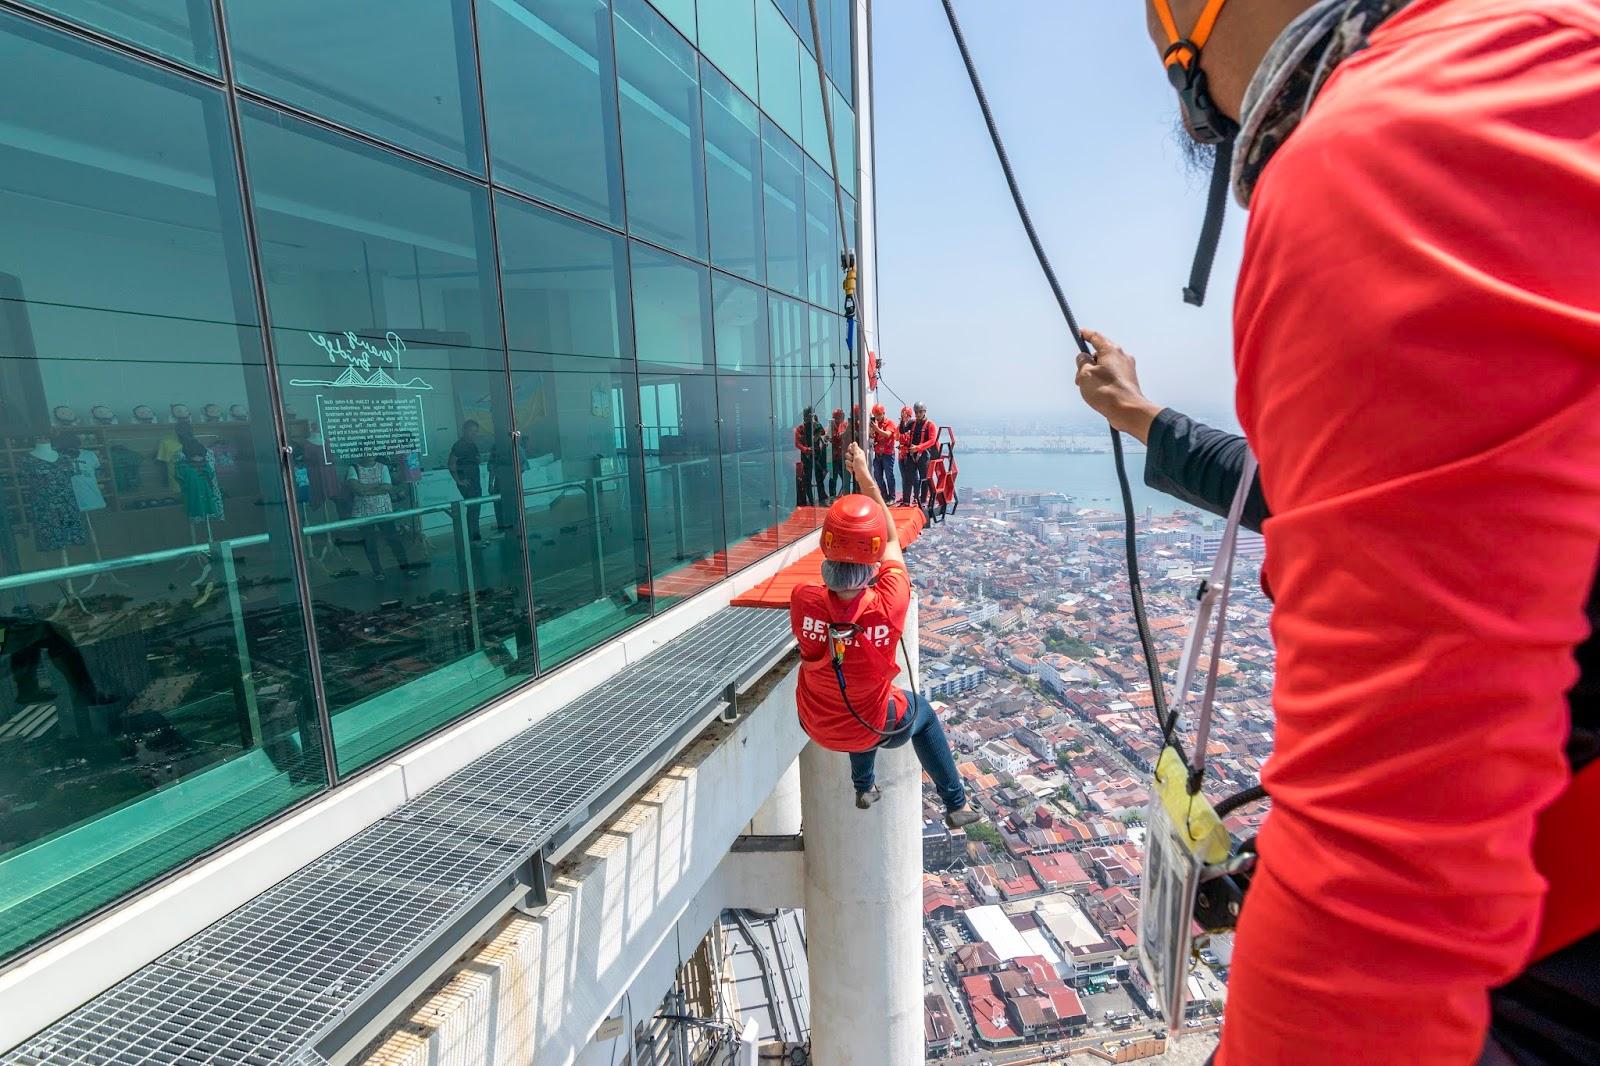 The Gravityz @ The Top, Komtar, Penang